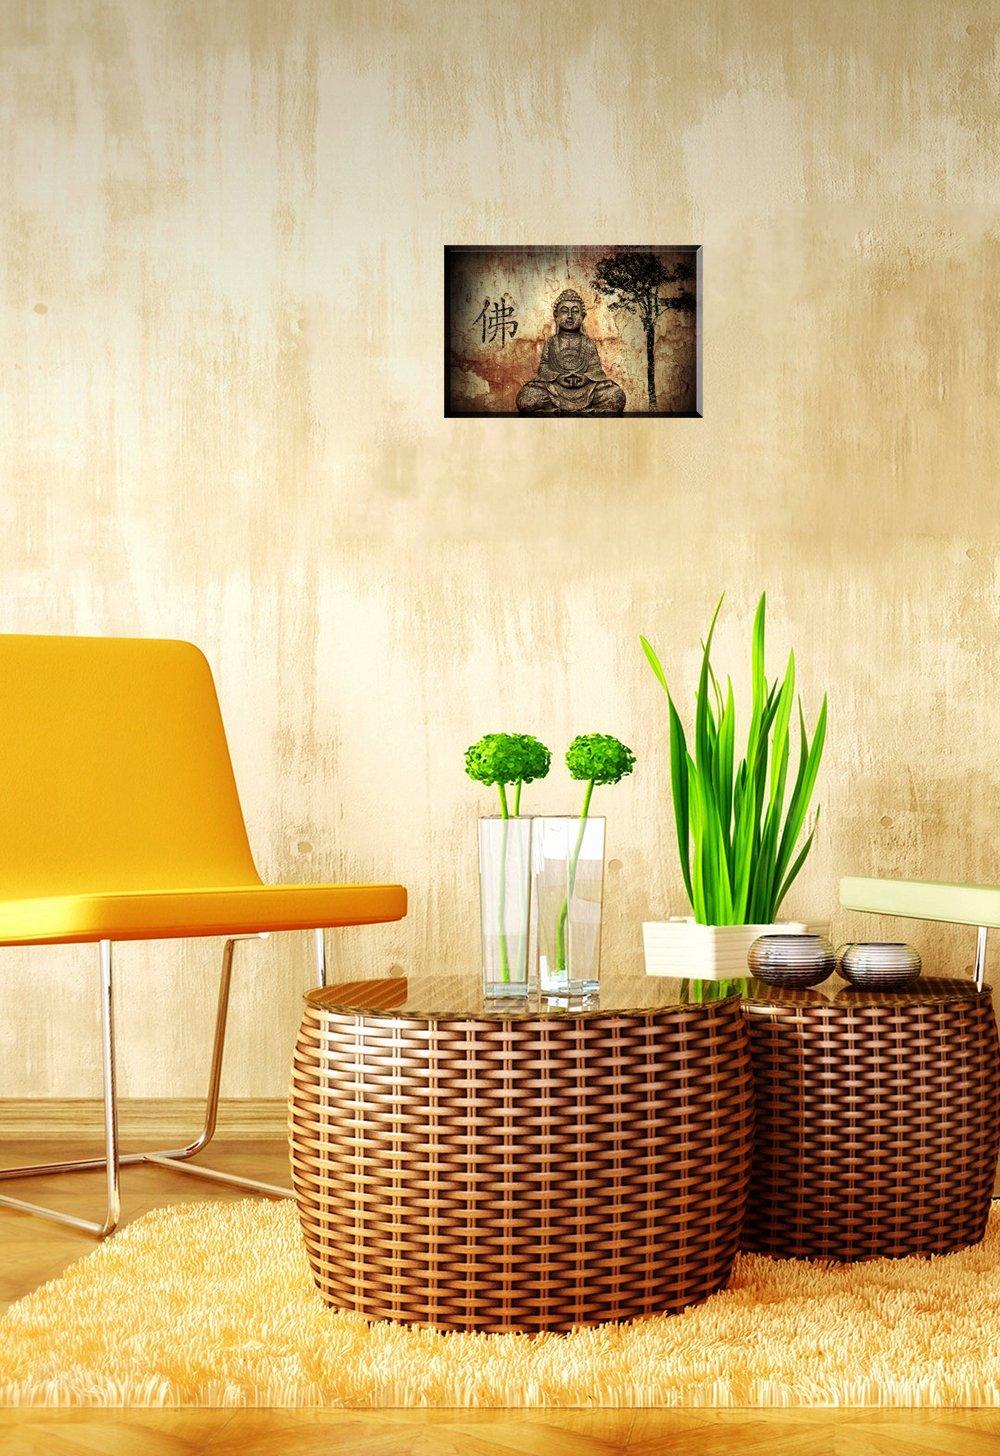 Amazon.com: PIY 1 Panel Buddha Wall Art, Zen Canvas Prints Wall ...